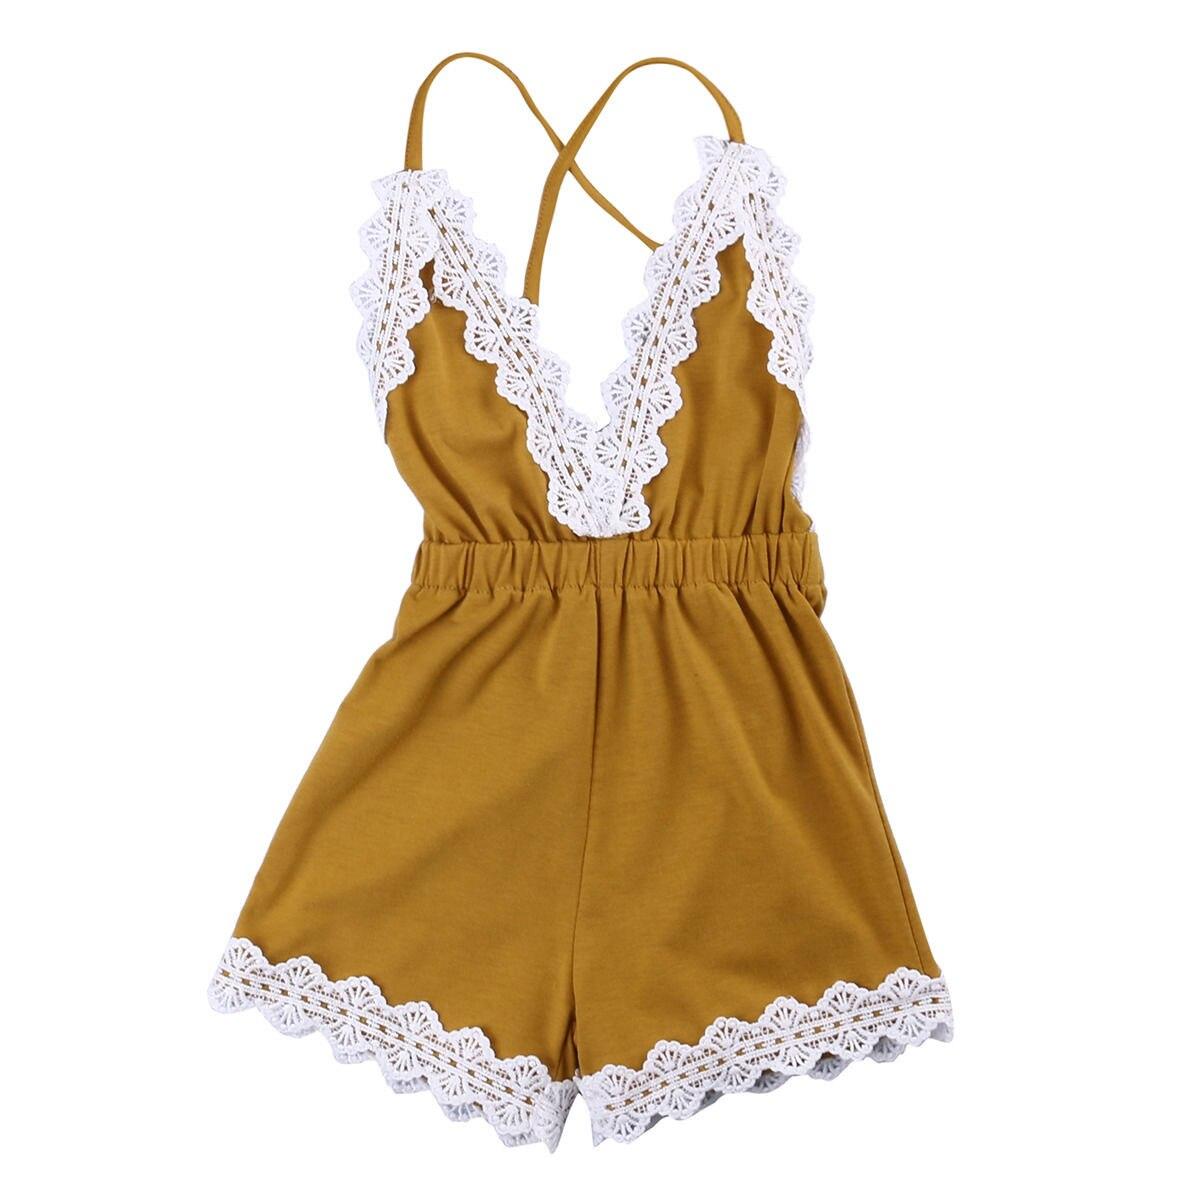 6115009d31a Floral Baby Girls Halter Lace One-pieces Romper Jumpsuit Sunsuit Clothes Children  Kids Girl Rompers Clothing0-24M